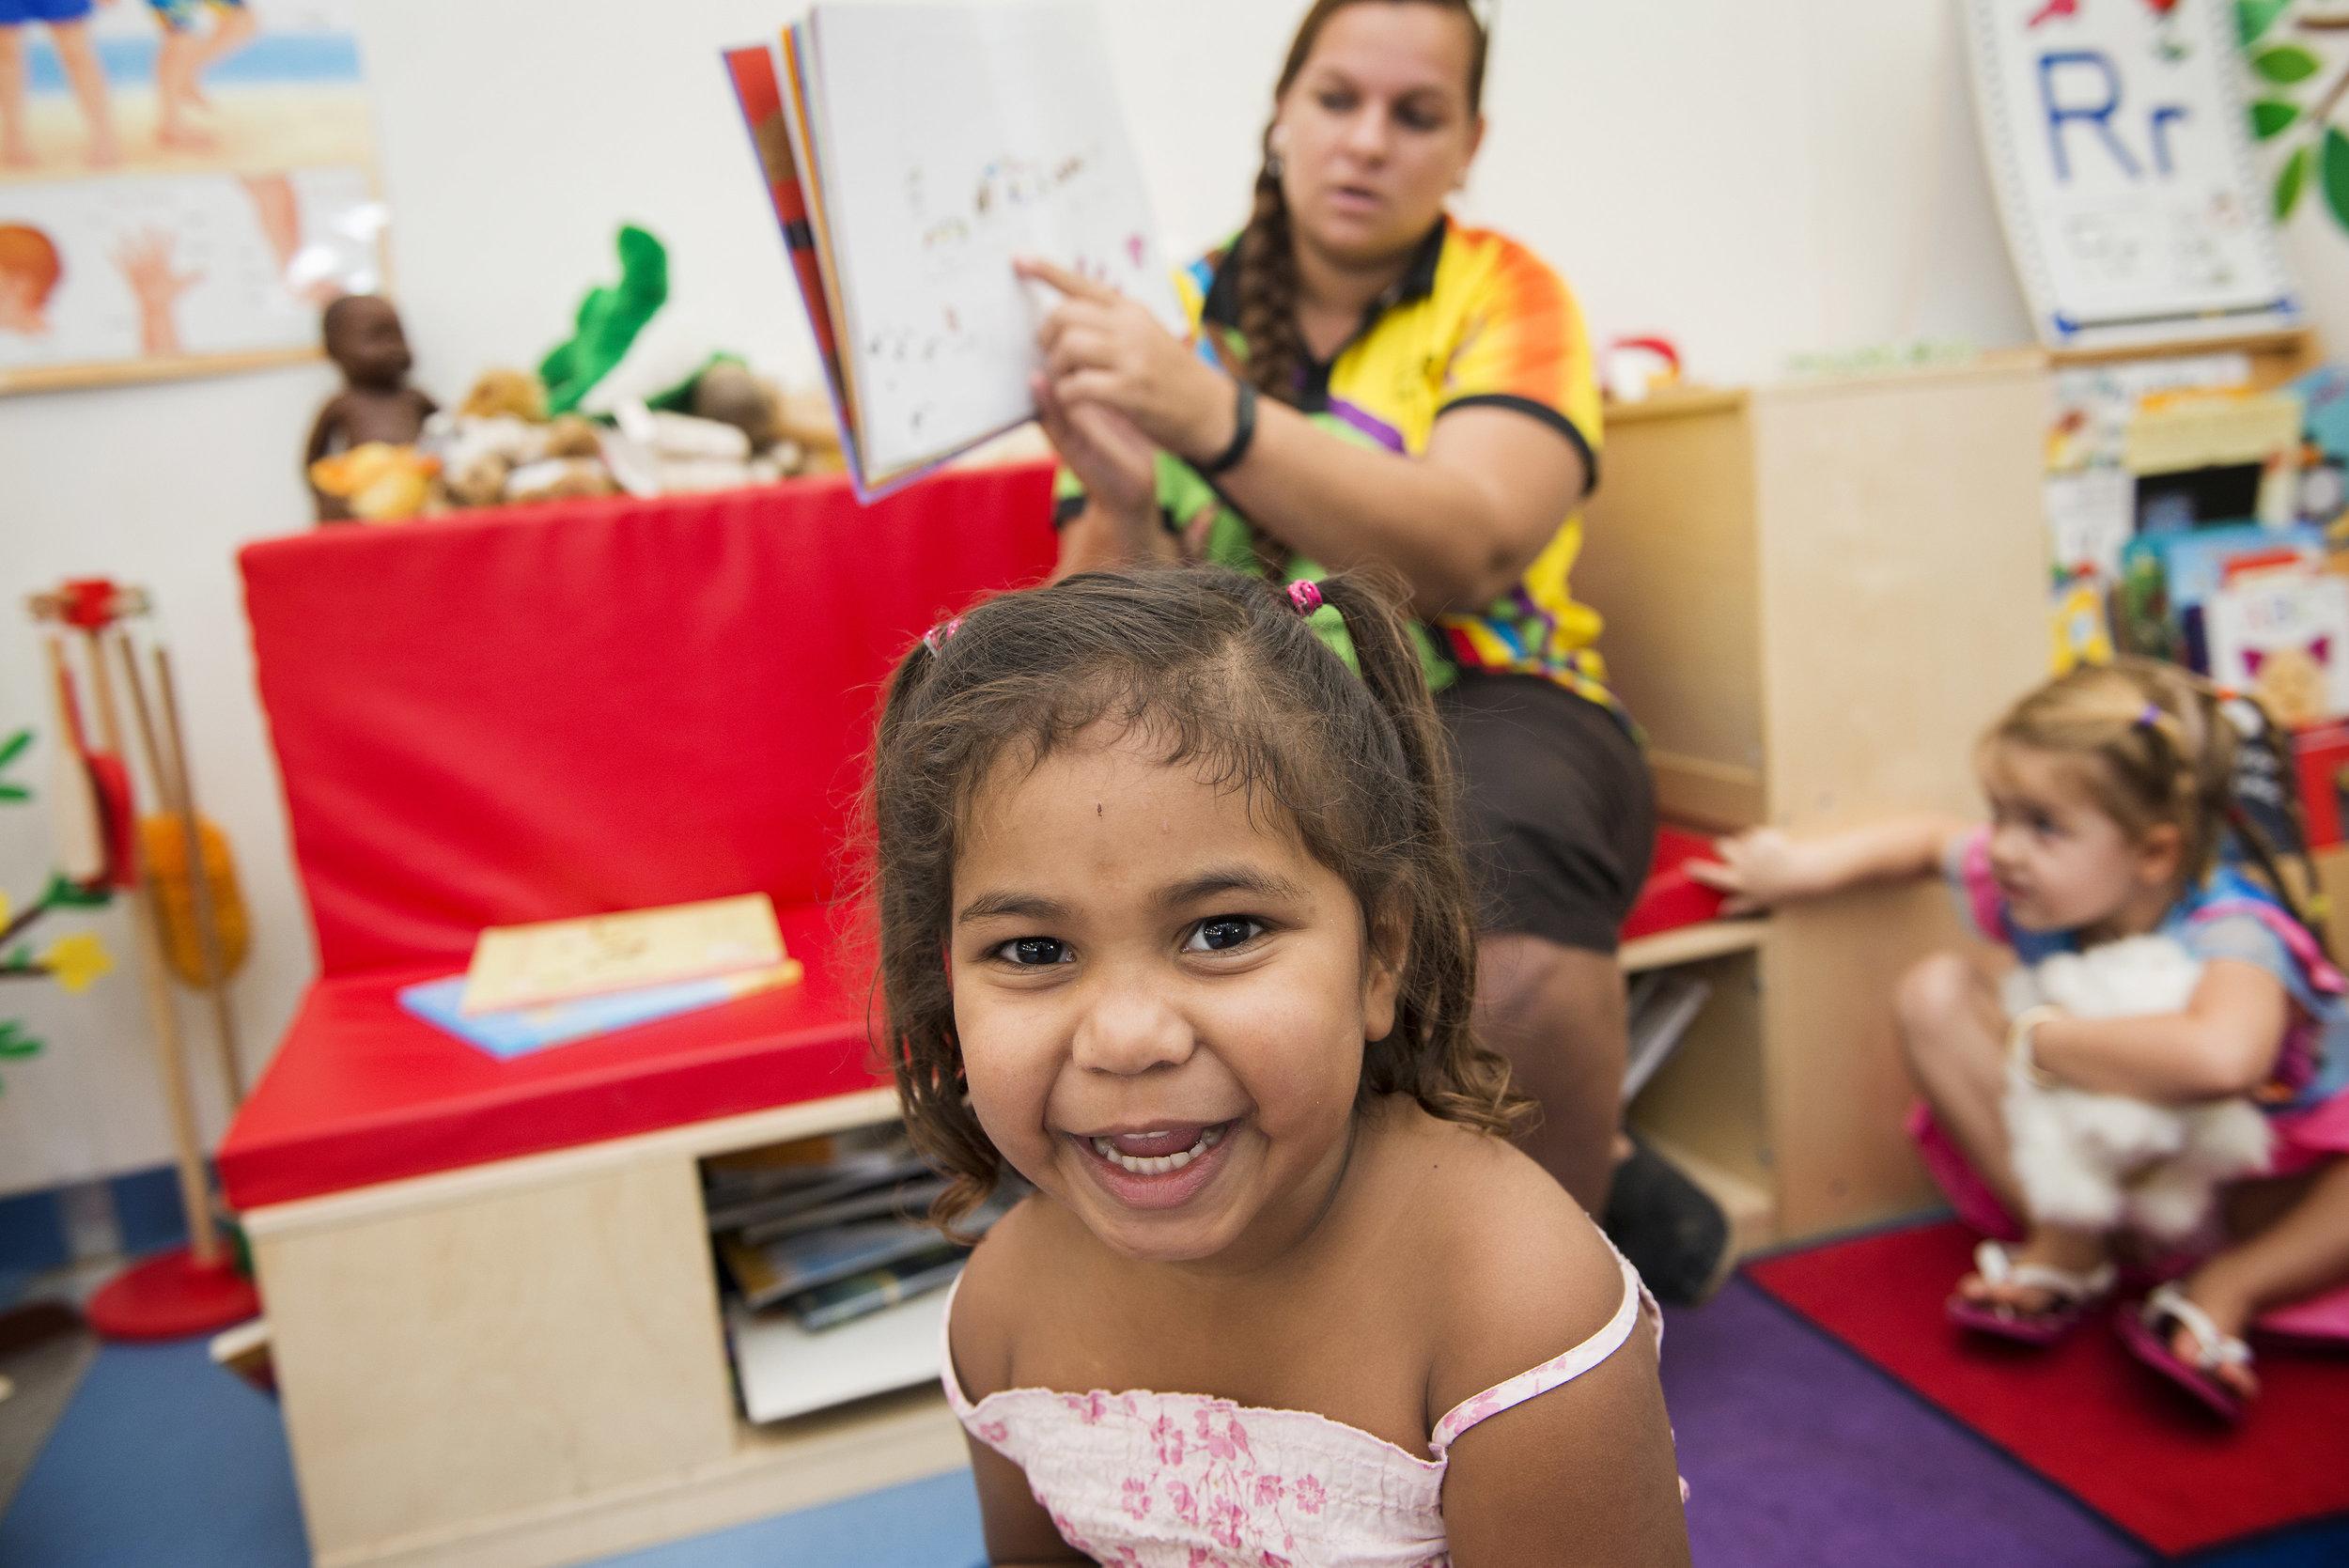 Early Childhood program. East Kimberly, Western Australia. 2015.